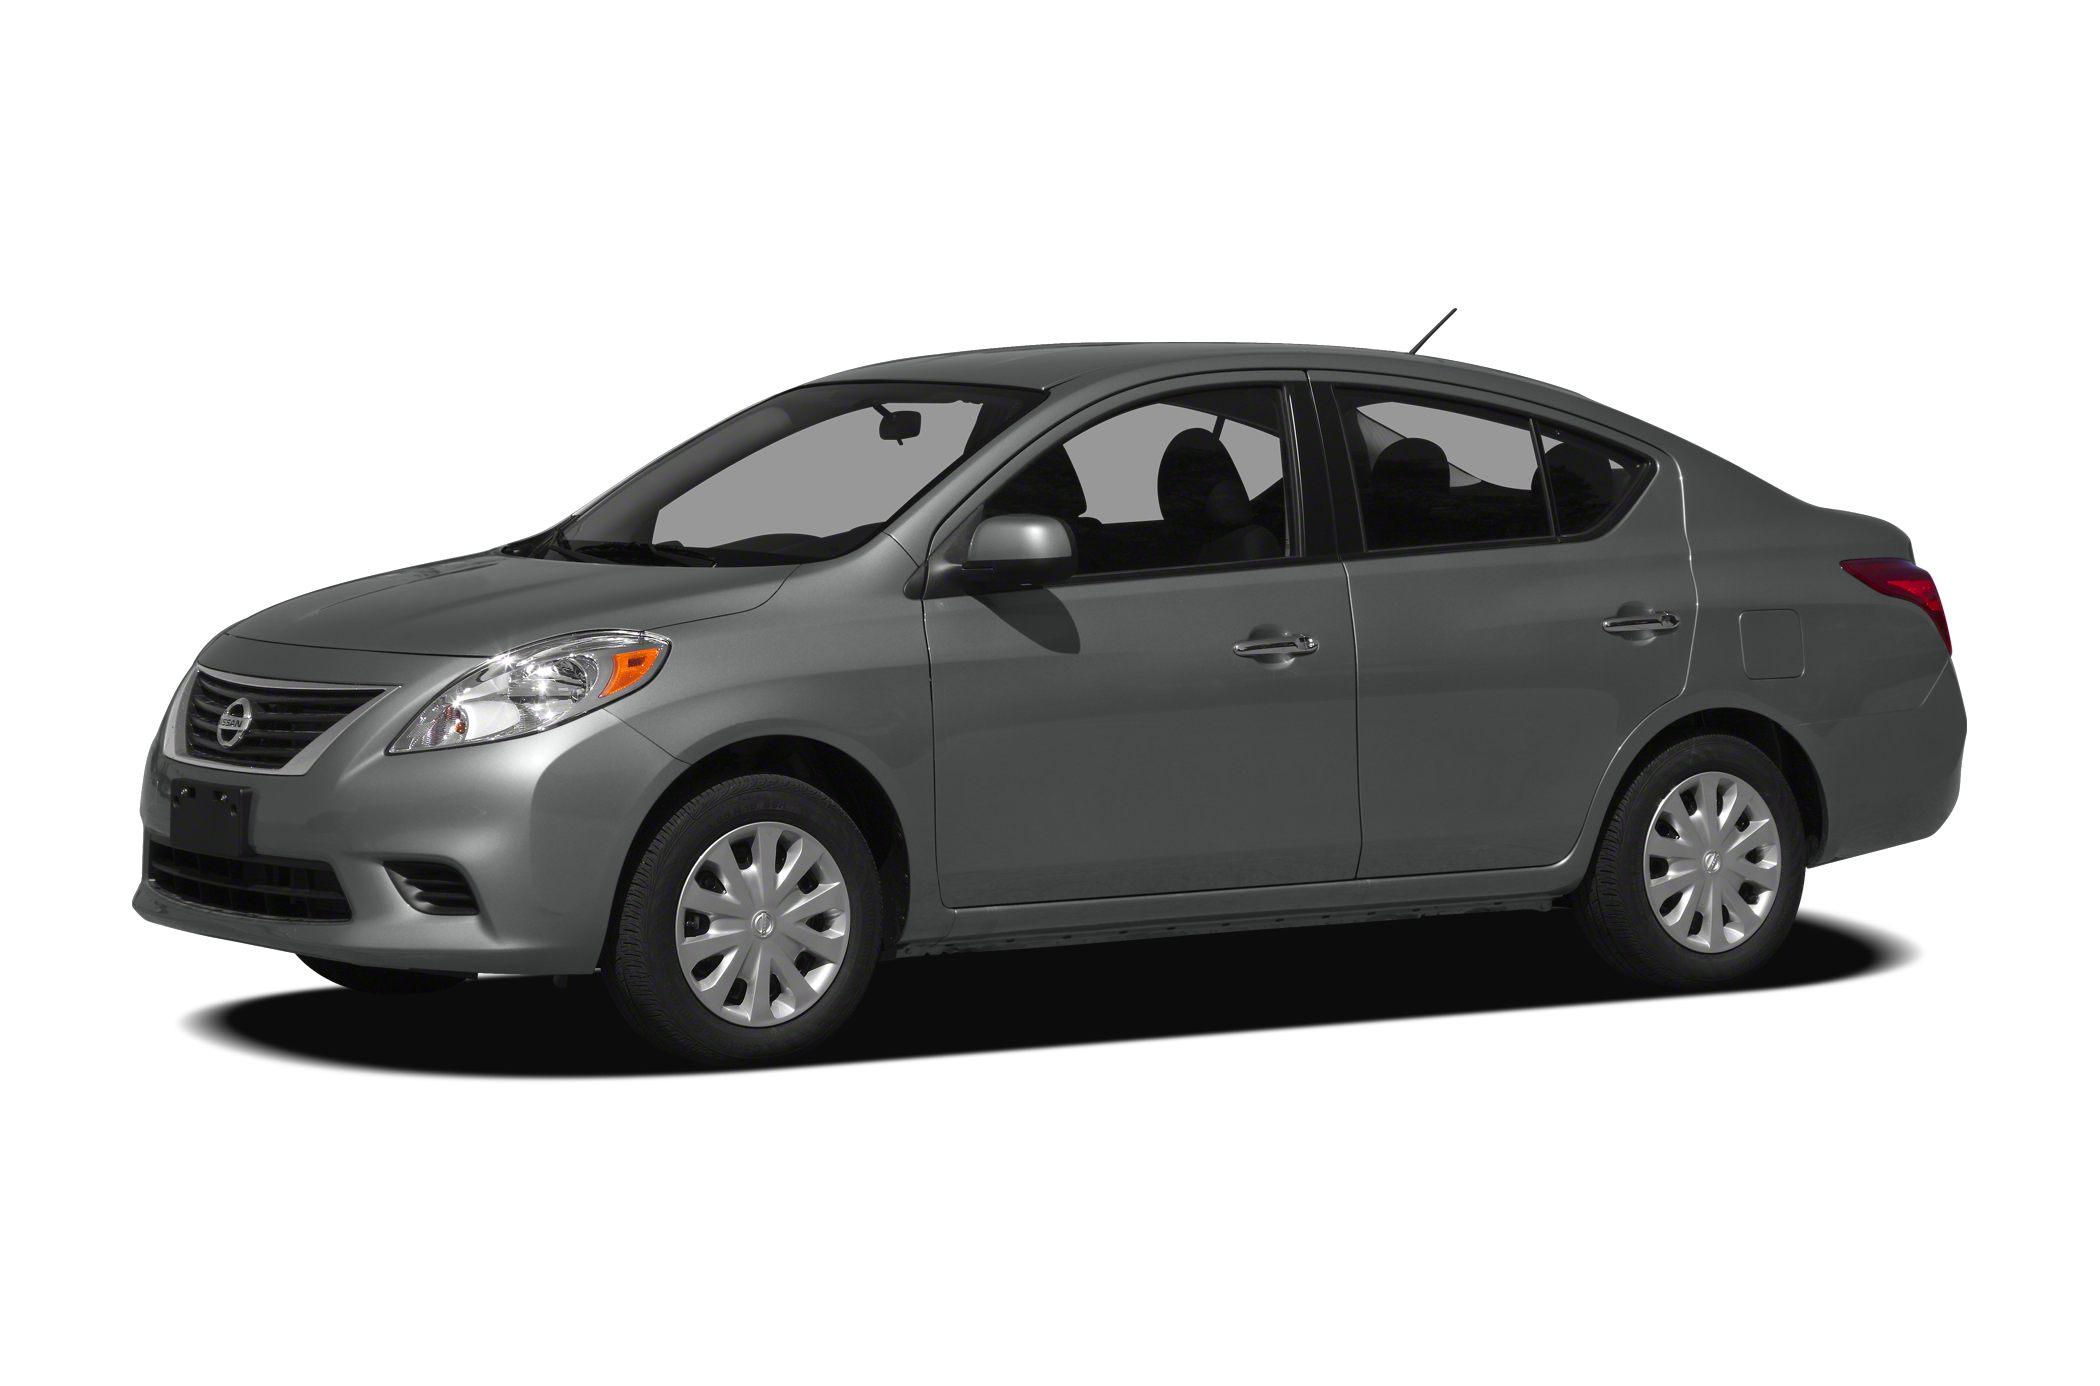 2012 nissan versa 16 sv 4dr sedan specs and prices vanachro Images